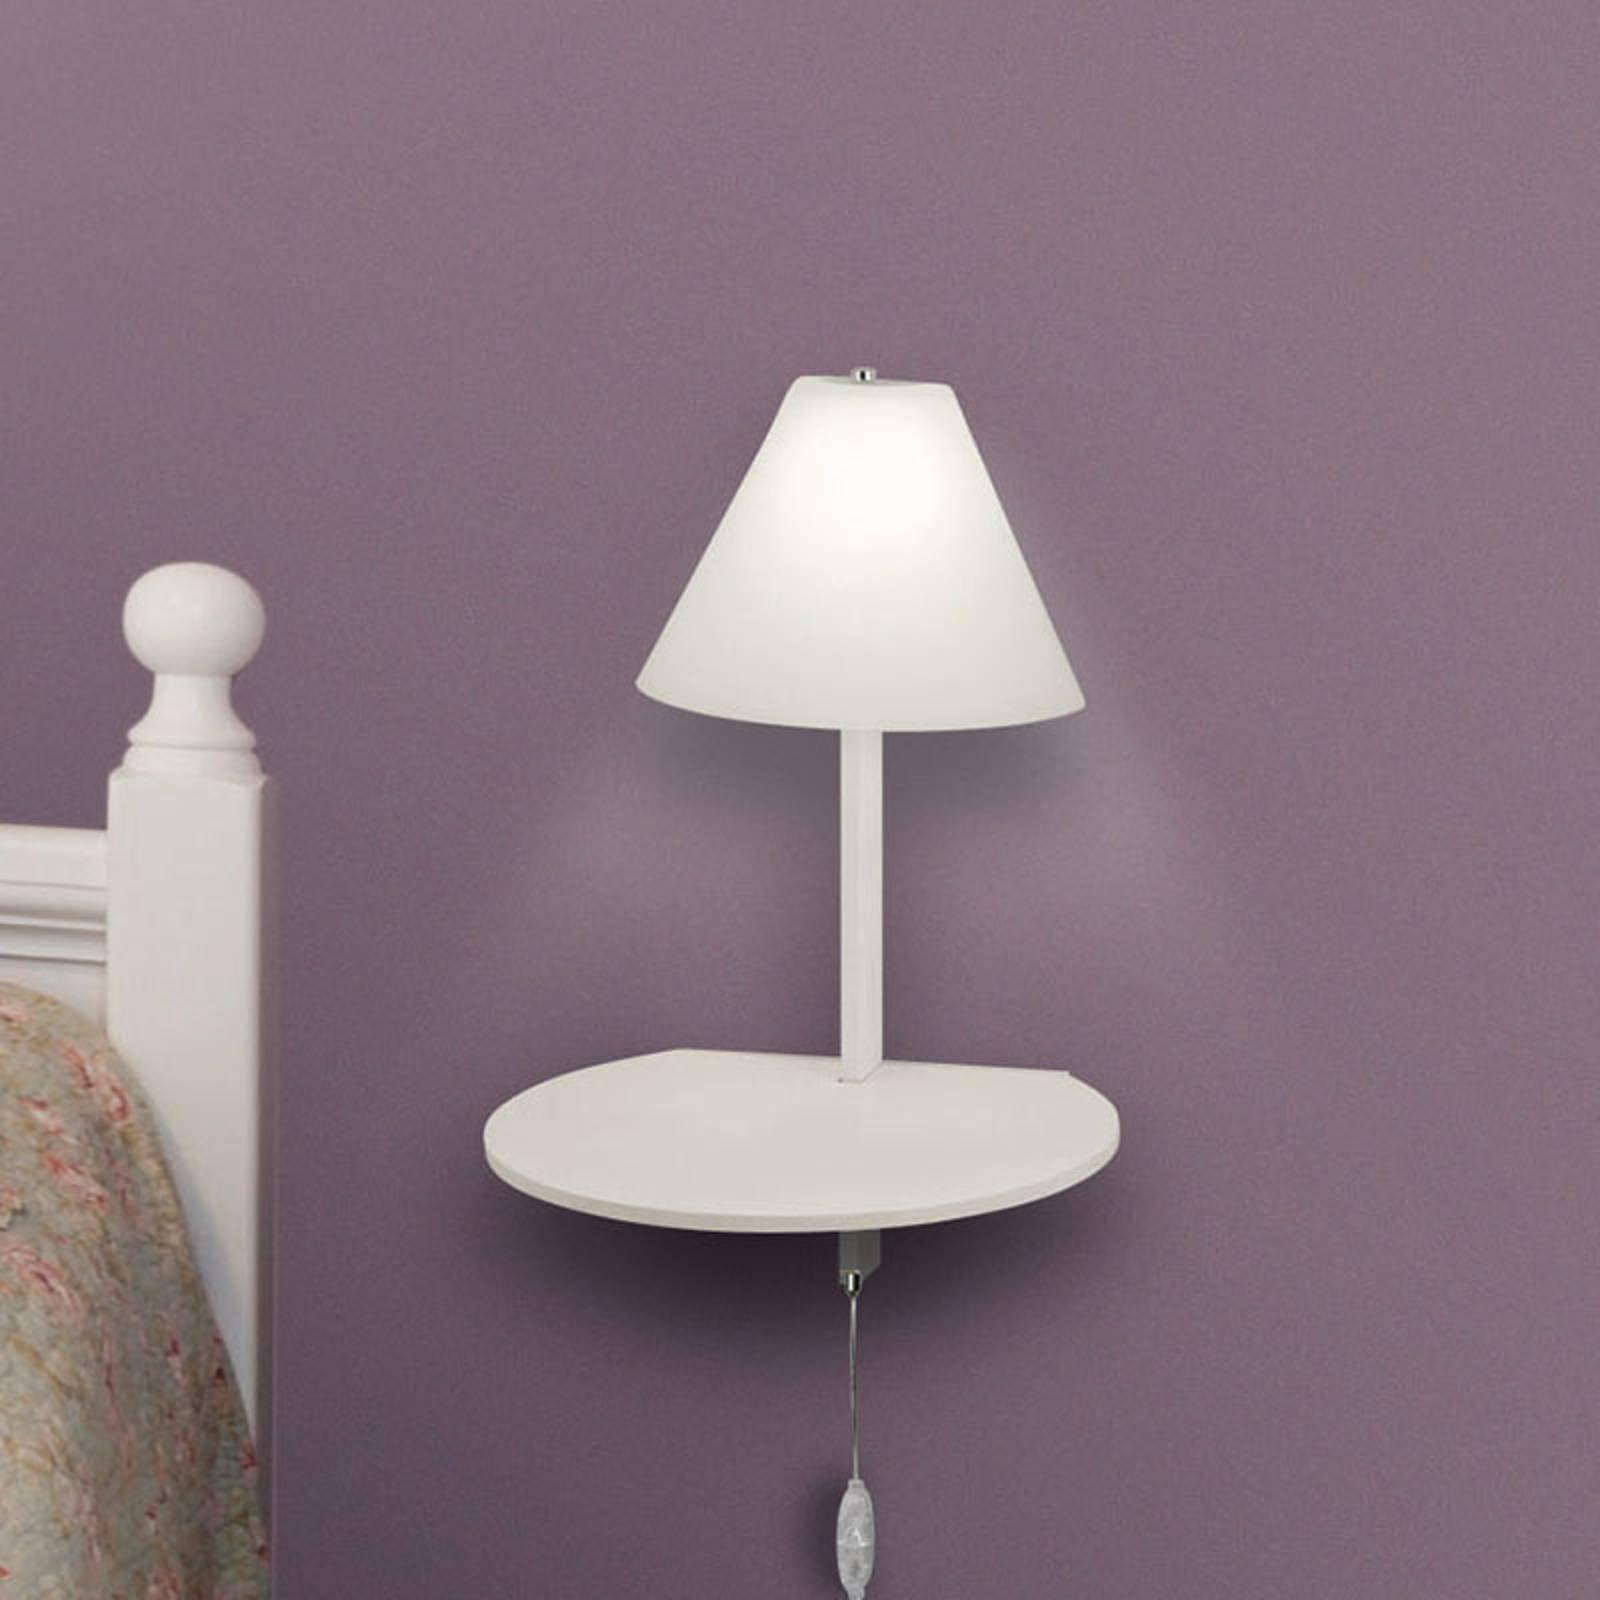 LED-vegglampe Goodnight, USB-port, hvit